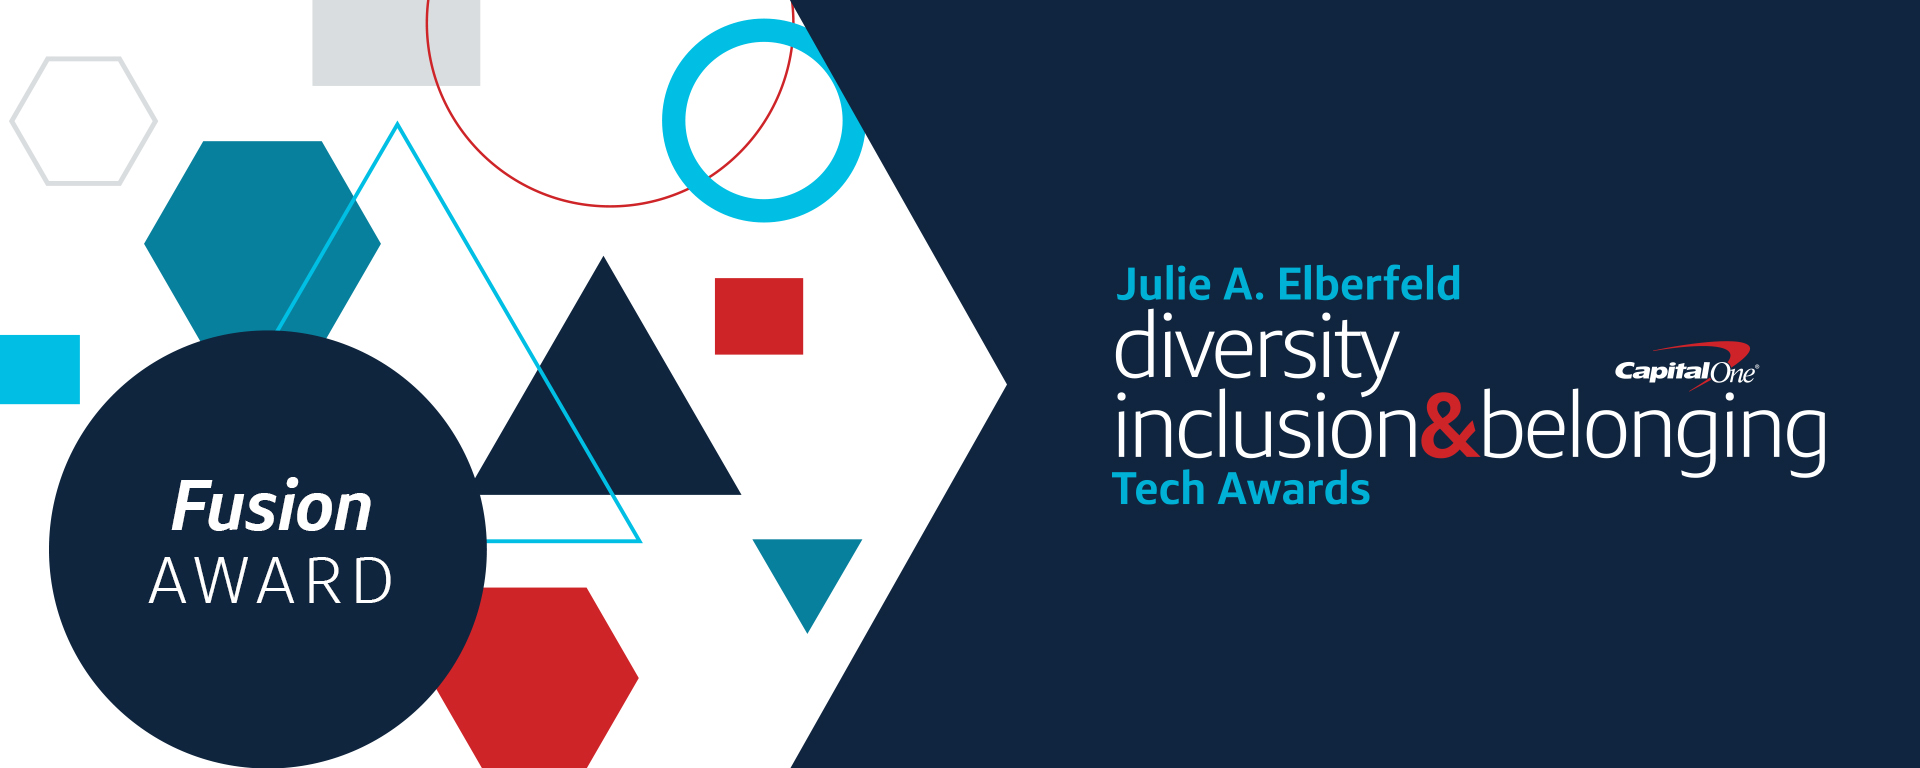 Julie A. Elberfeld Diversity, Inclusion & Belonging Tech Fusion Award